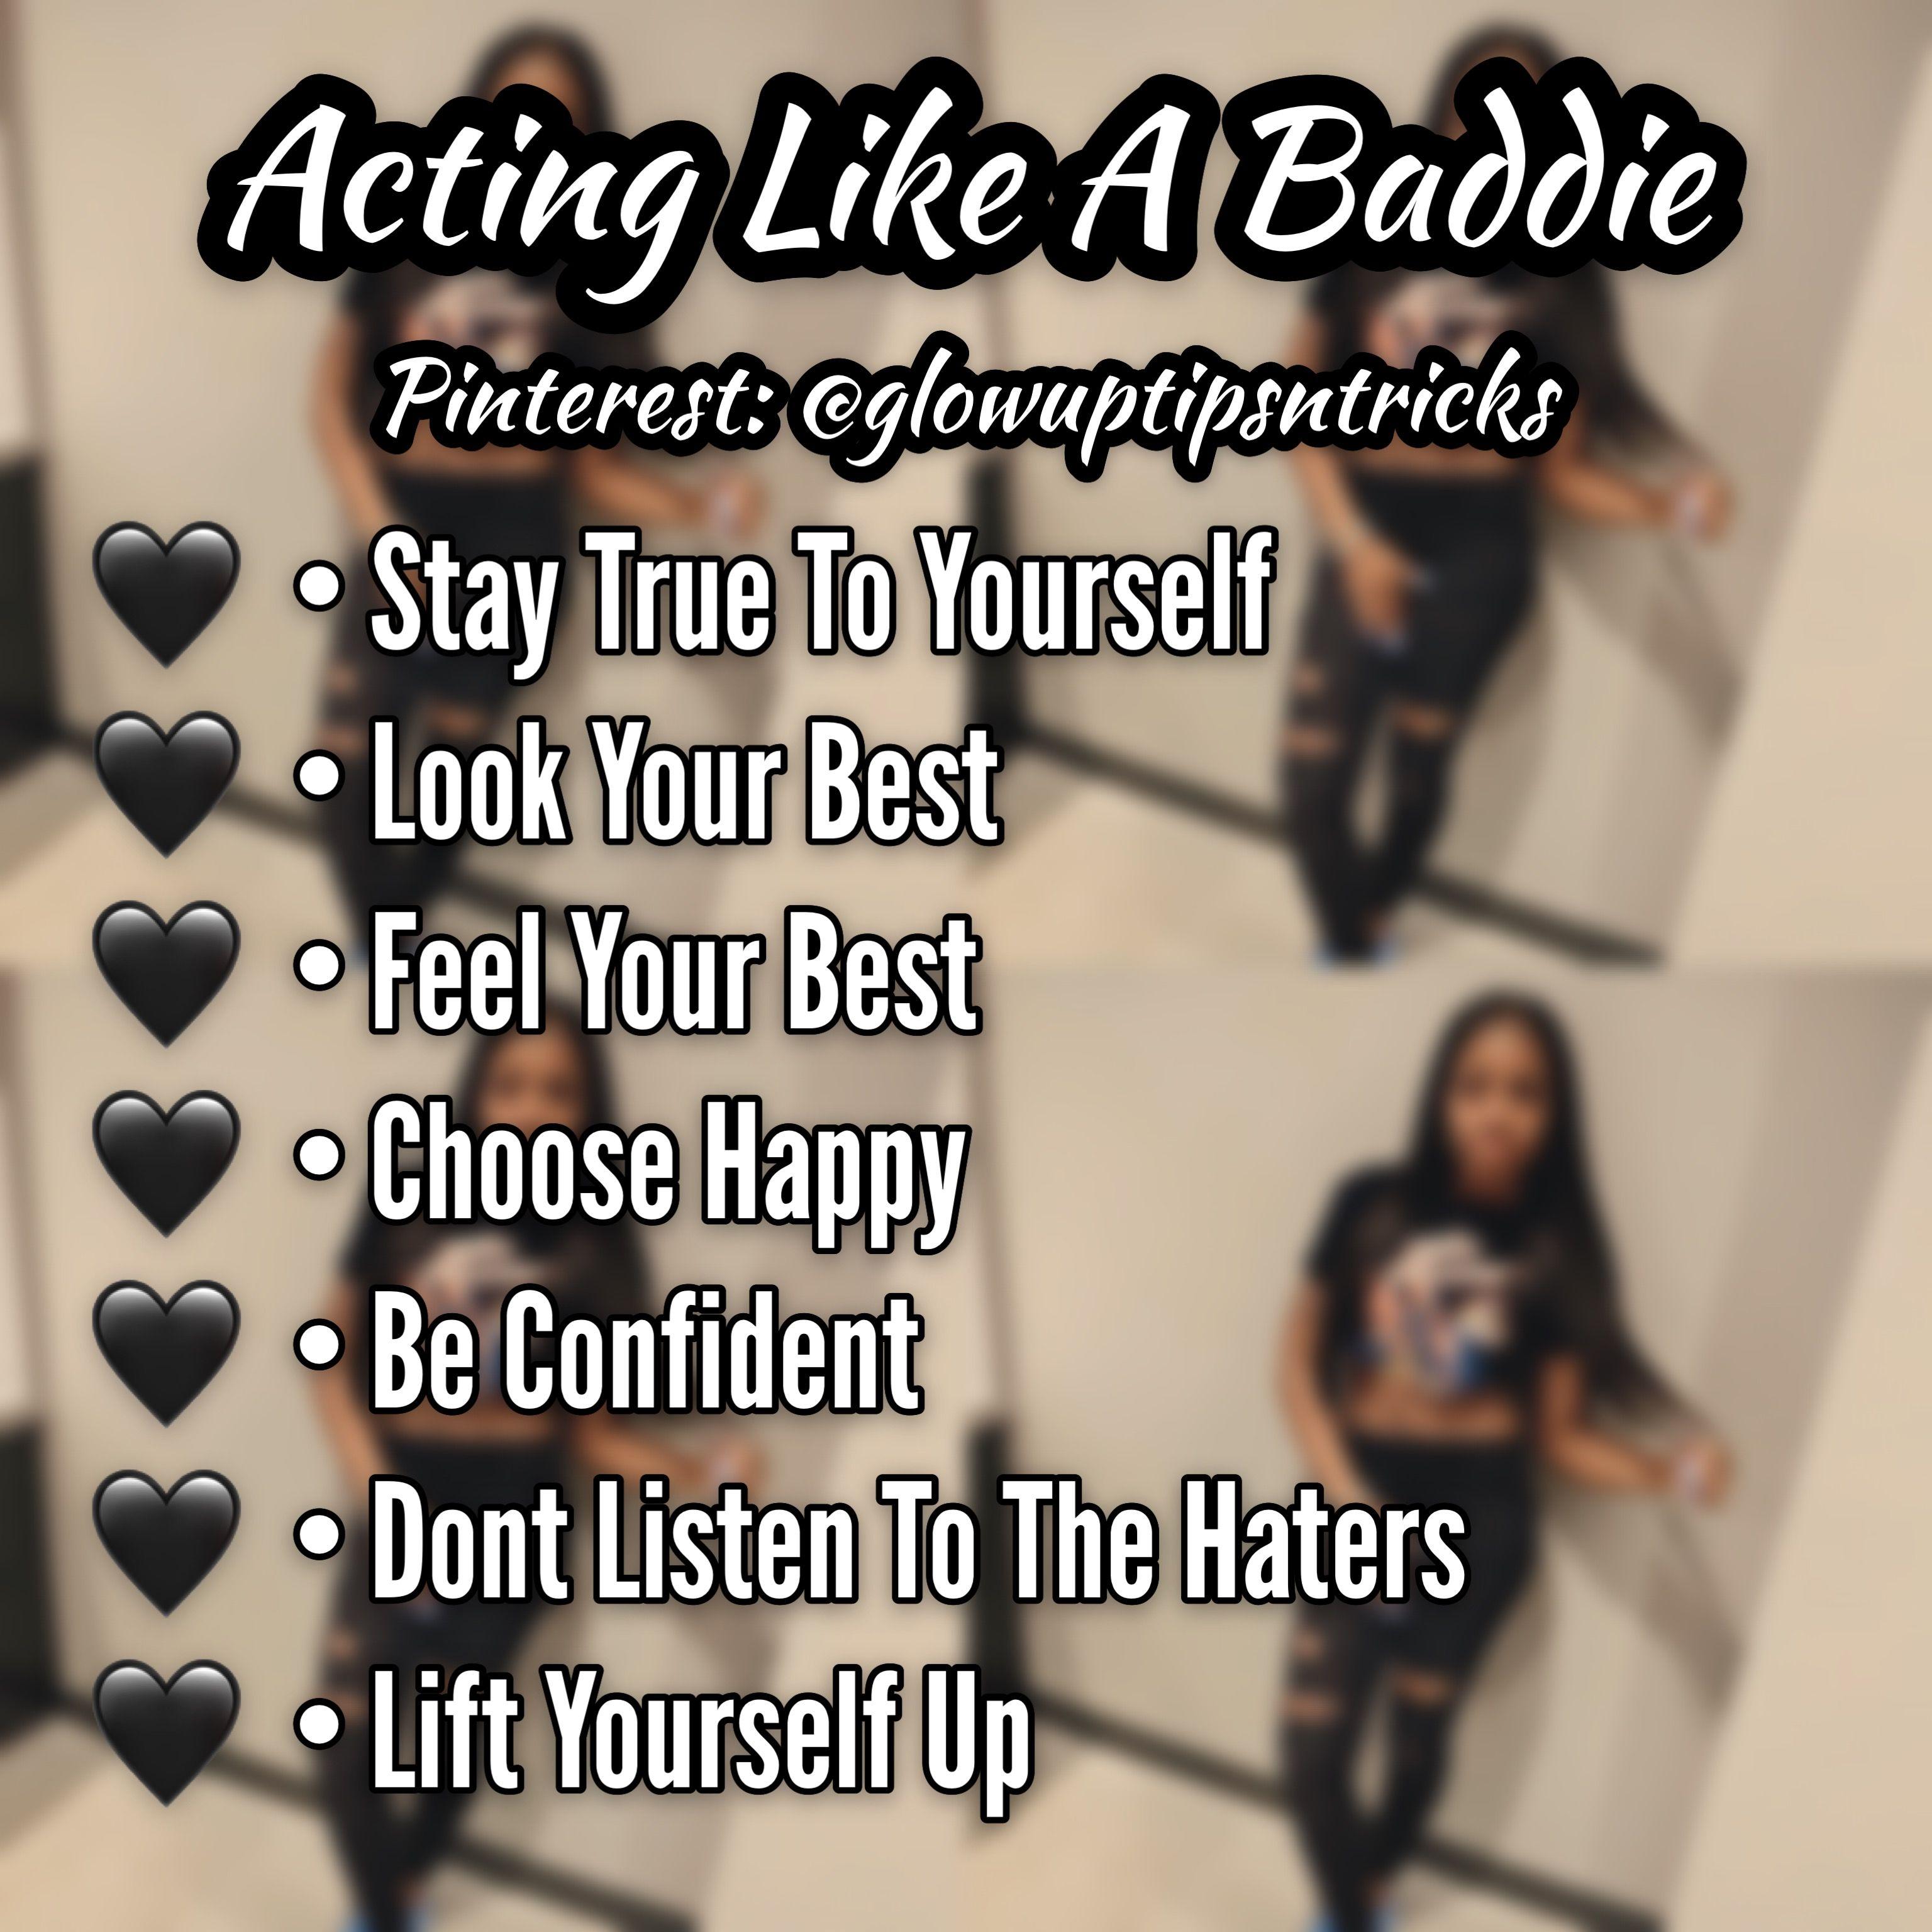 Acting Like A Baddie Glowuptipsntricks Baddie Tips Glow Up Tips Hoe Tips